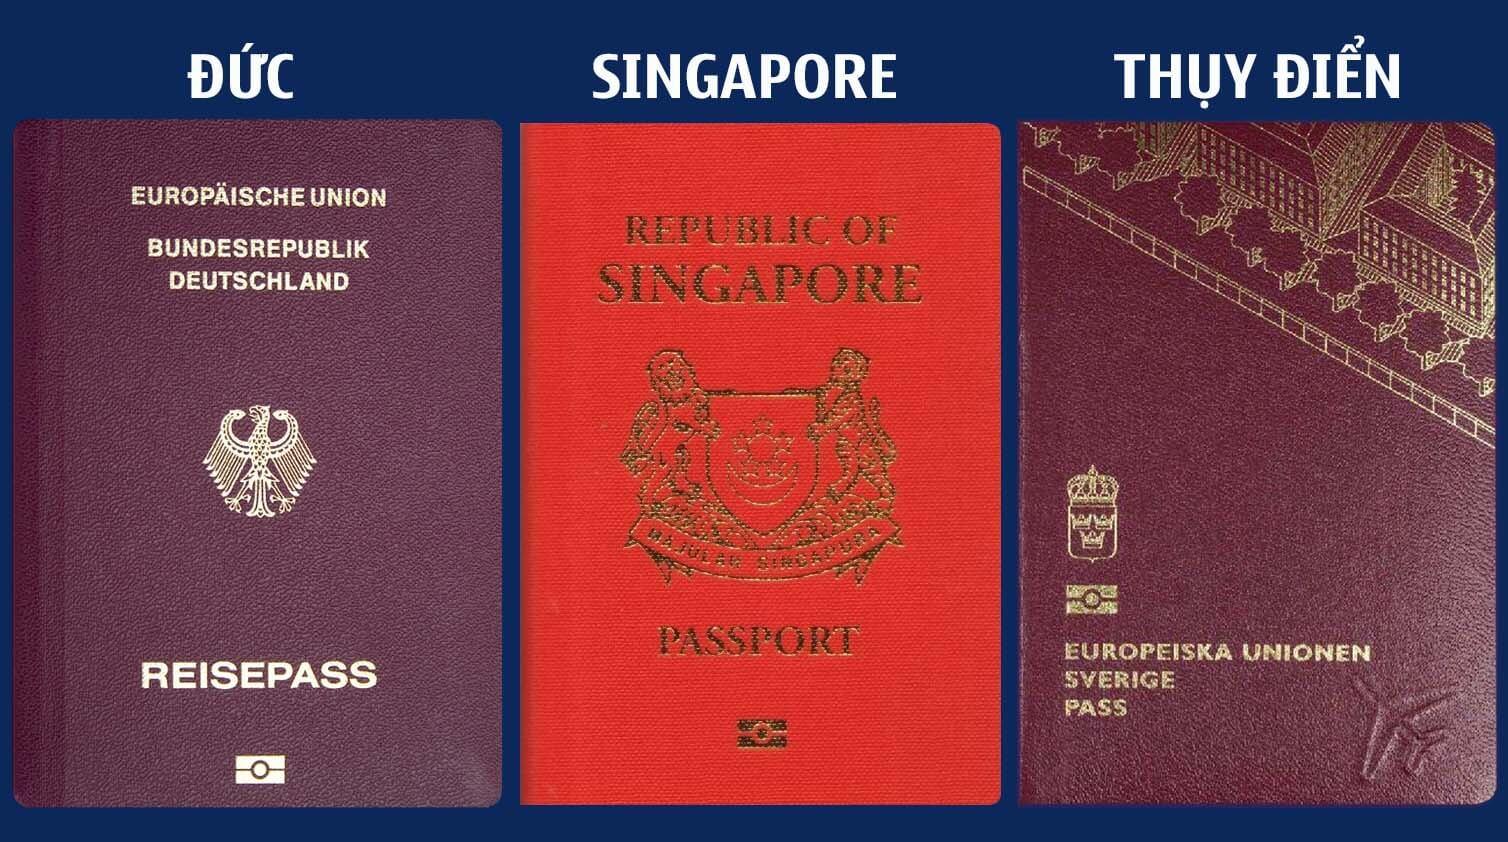 ho chieu singapore quyen luc nhat TG 2